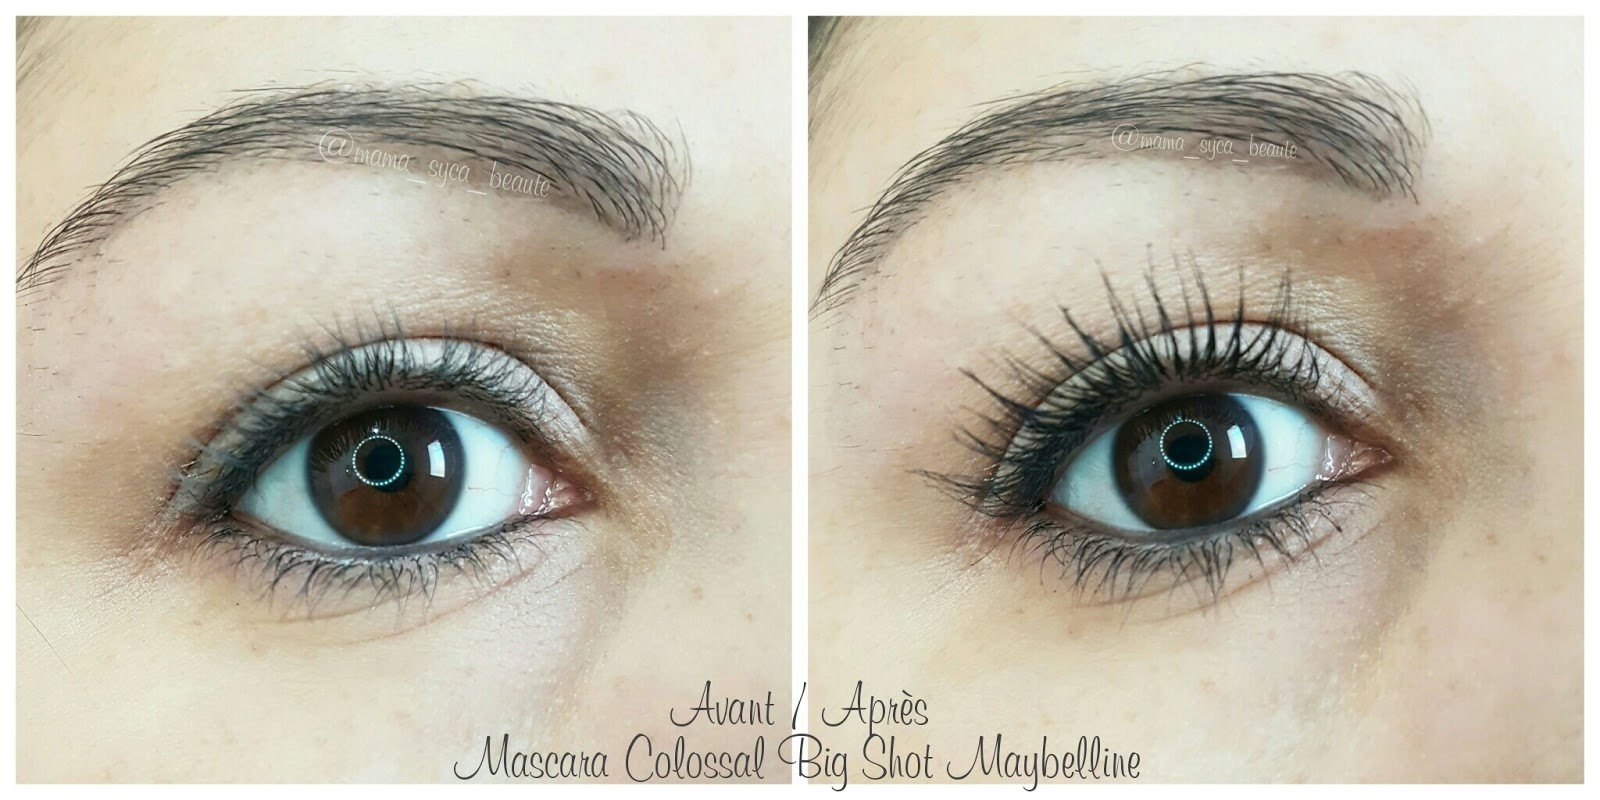 avis_mascara_big_shot_maybelline_concours_mama_syca_beaute